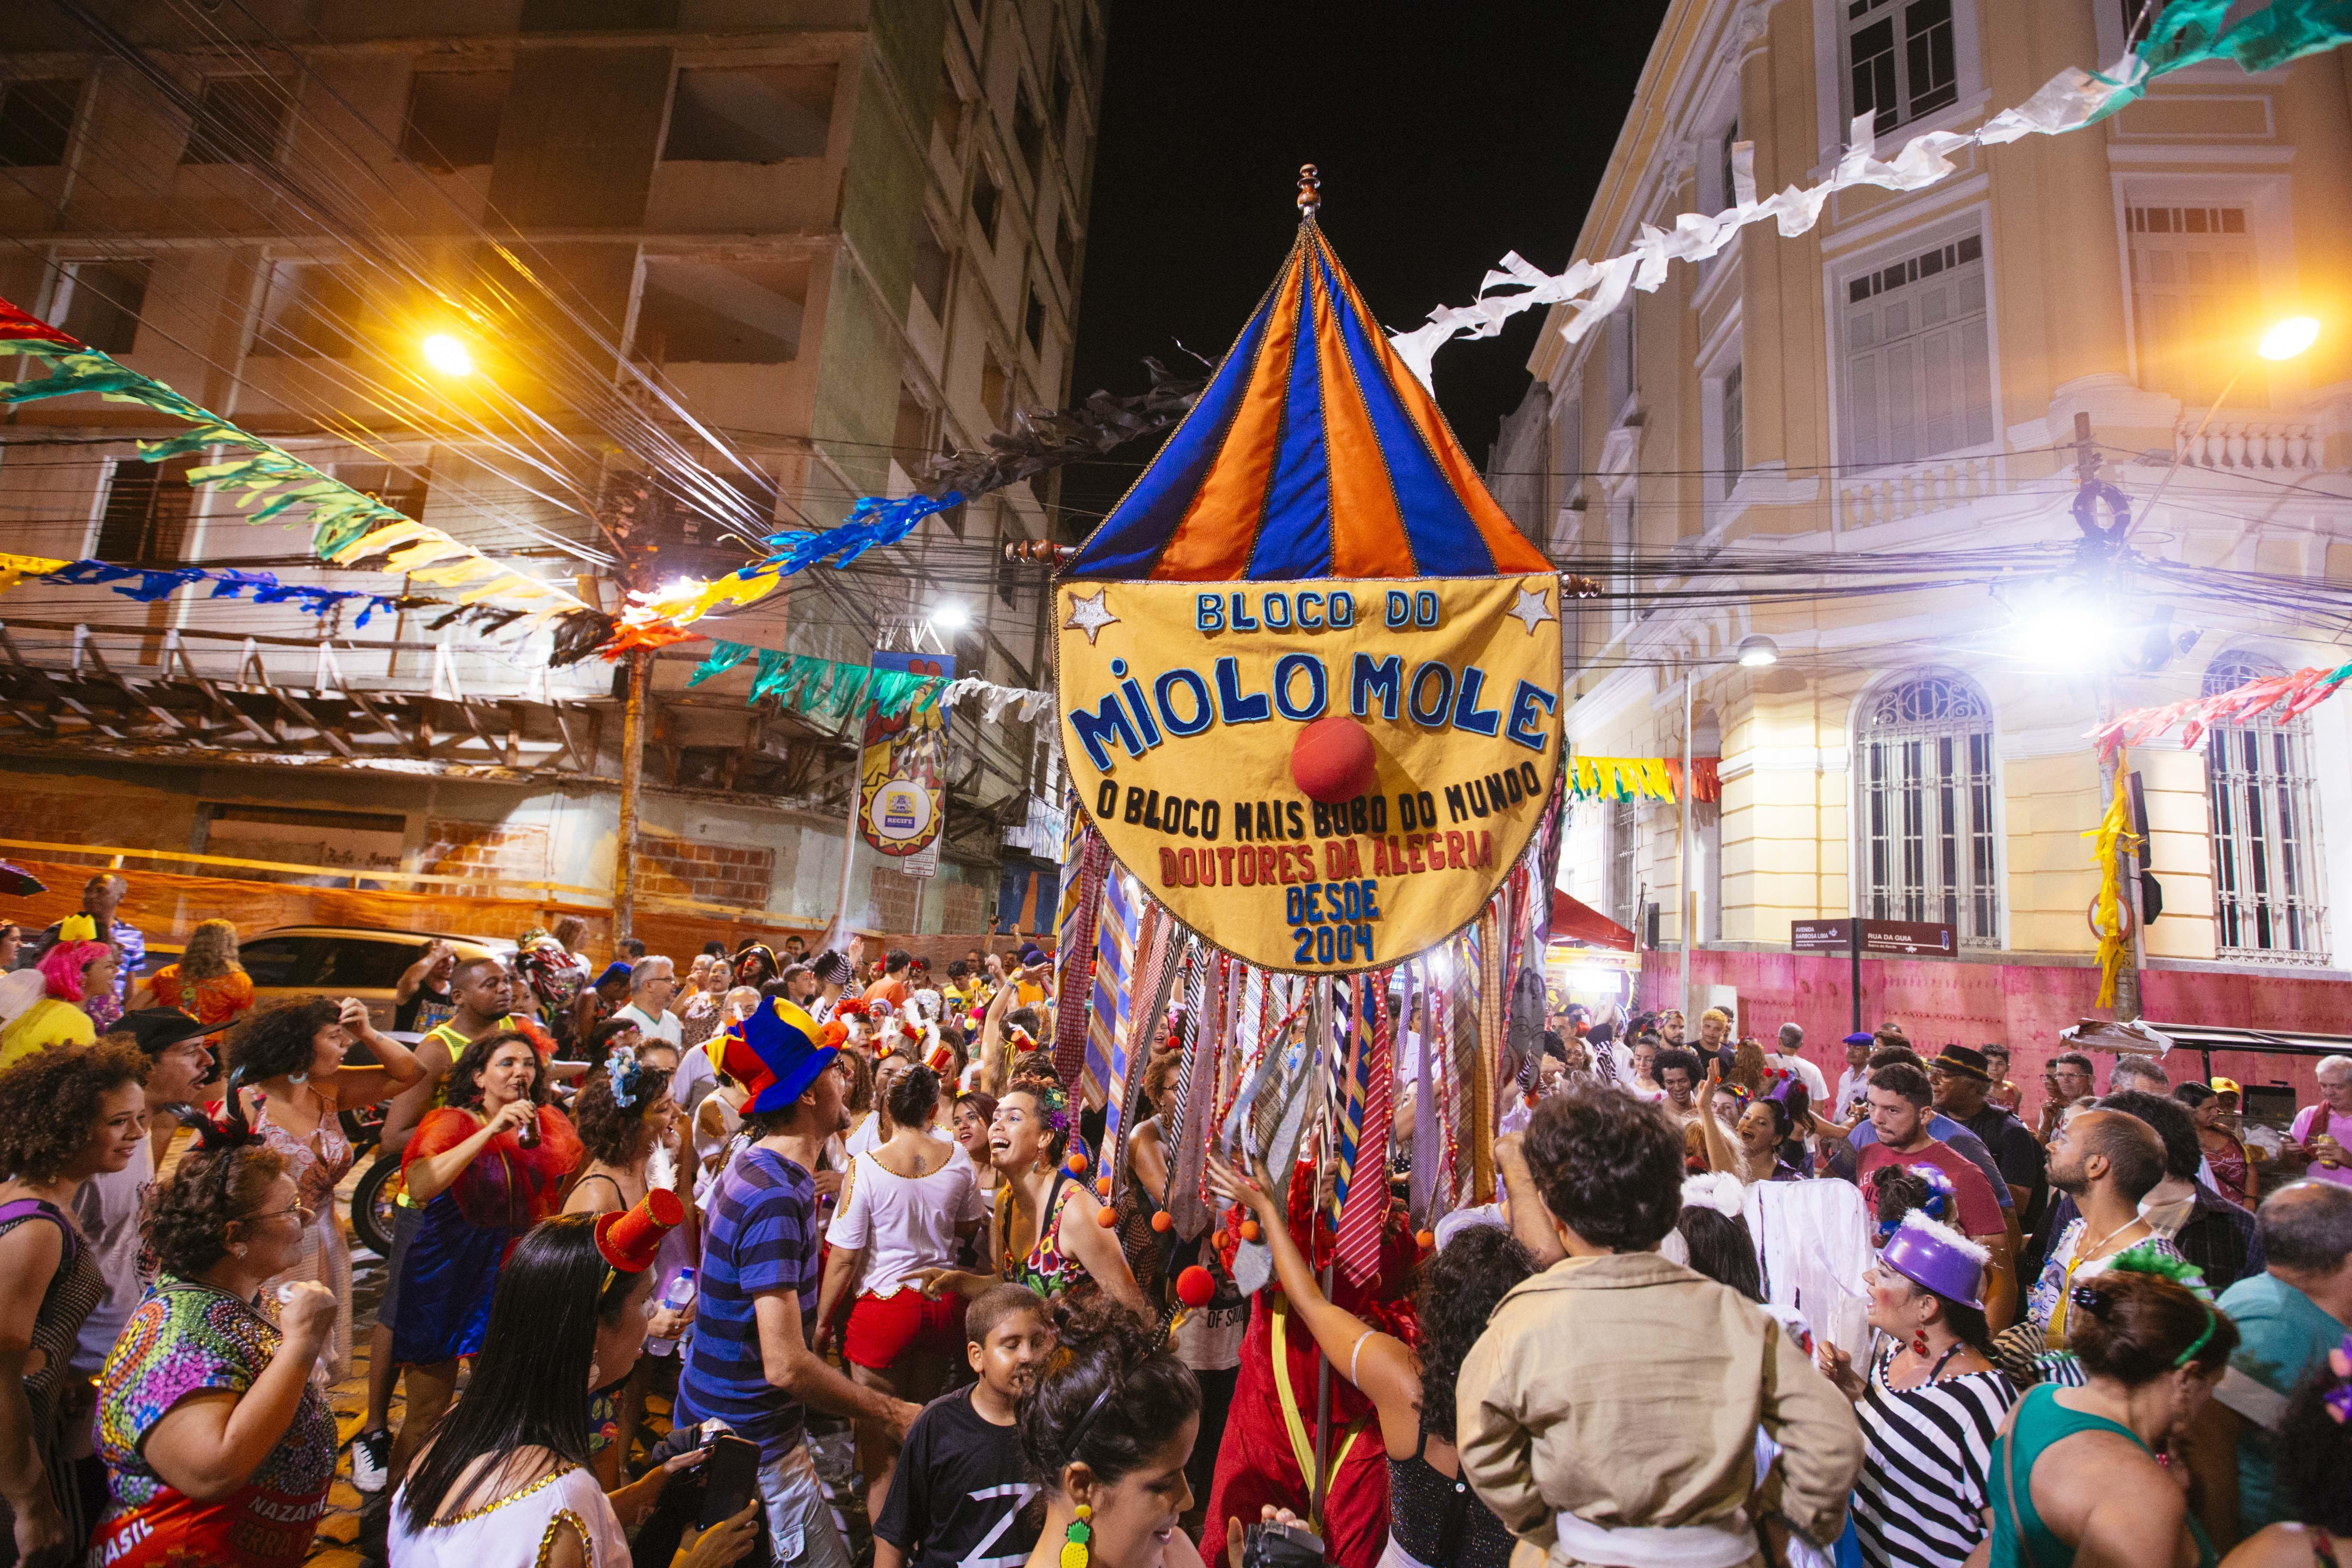 Bloco do Miolo Mole desfila dia 8 trazendo Wellington Nogueira